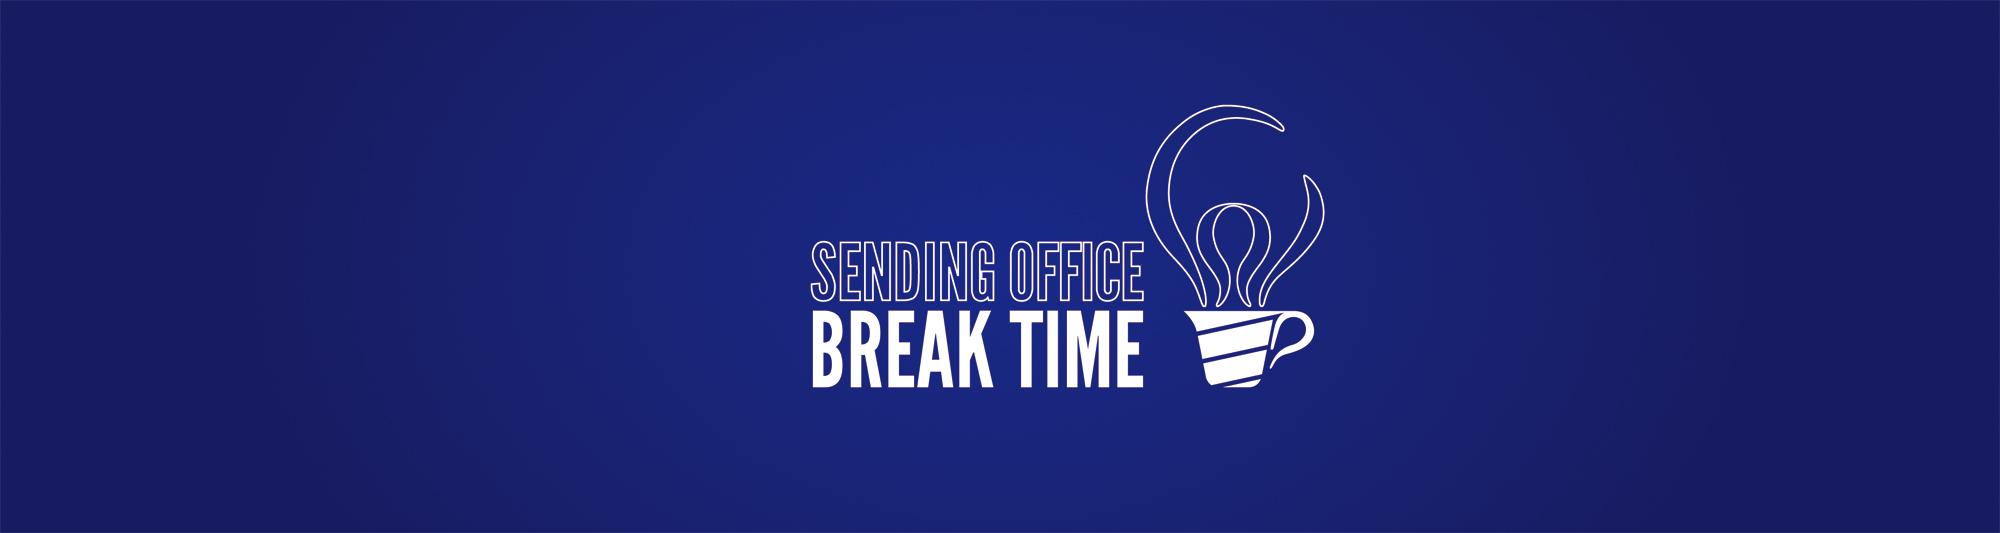 Break Time Images Usseek Com